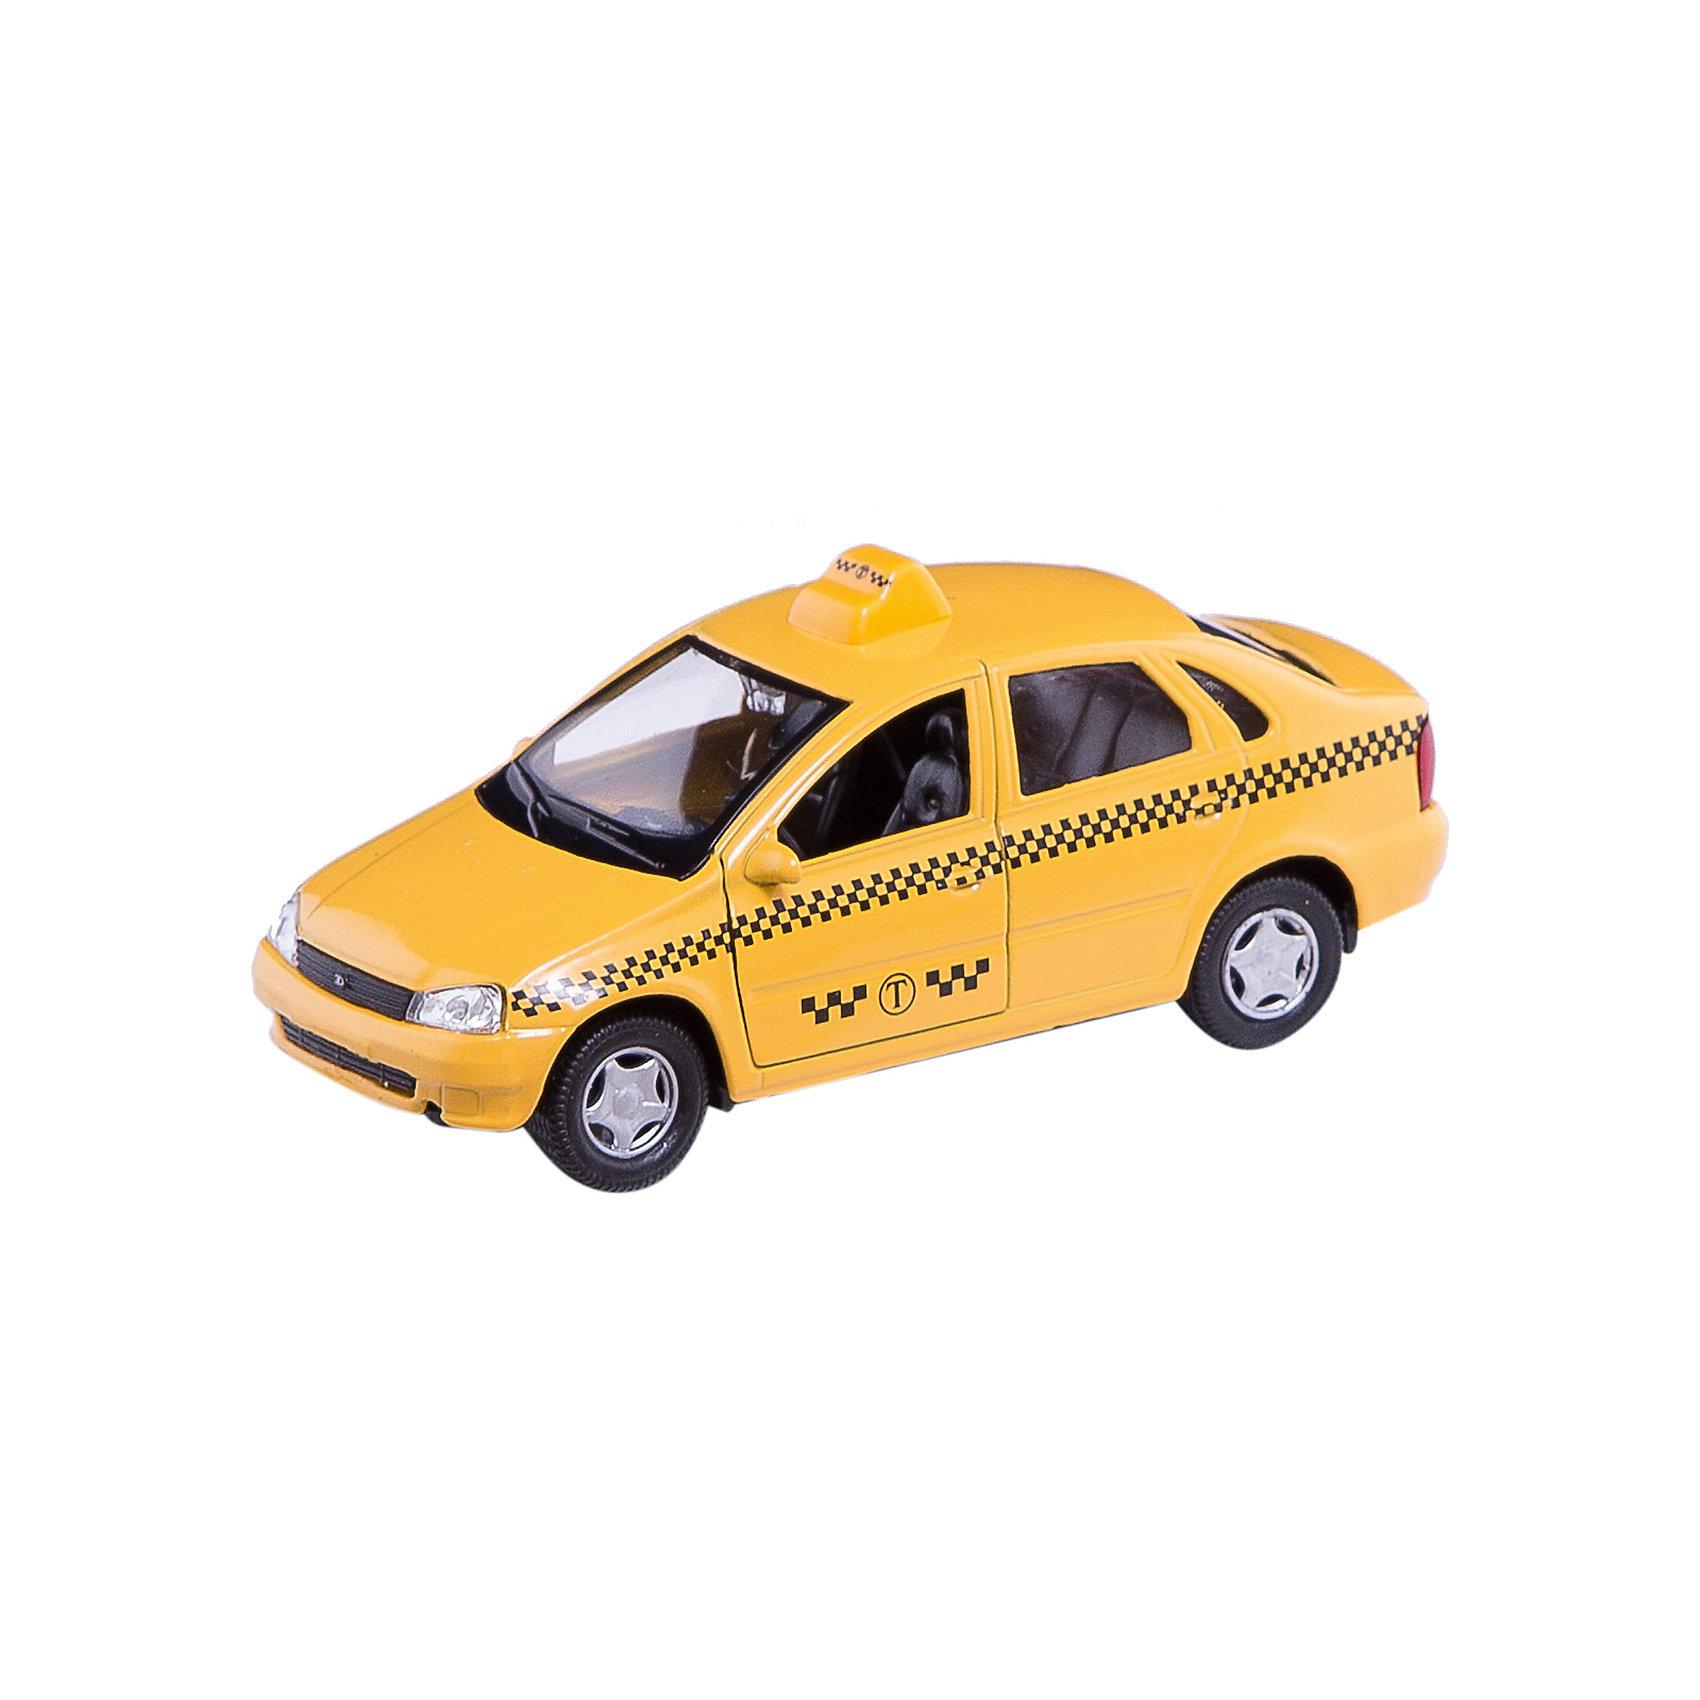 Машинка Lada Kalina такси 1:34, AutotimeМашинки<br><br><br>Ширина мм: 165<br>Глубина мм: 57<br>Высота мм: 75<br>Вес г: 13<br>Возраст от месяцев: 36<br>Возраст до месяцев: 2147483647<br>Пол: Мужской<br>Возраст: Детский<br>SKU: 5583912